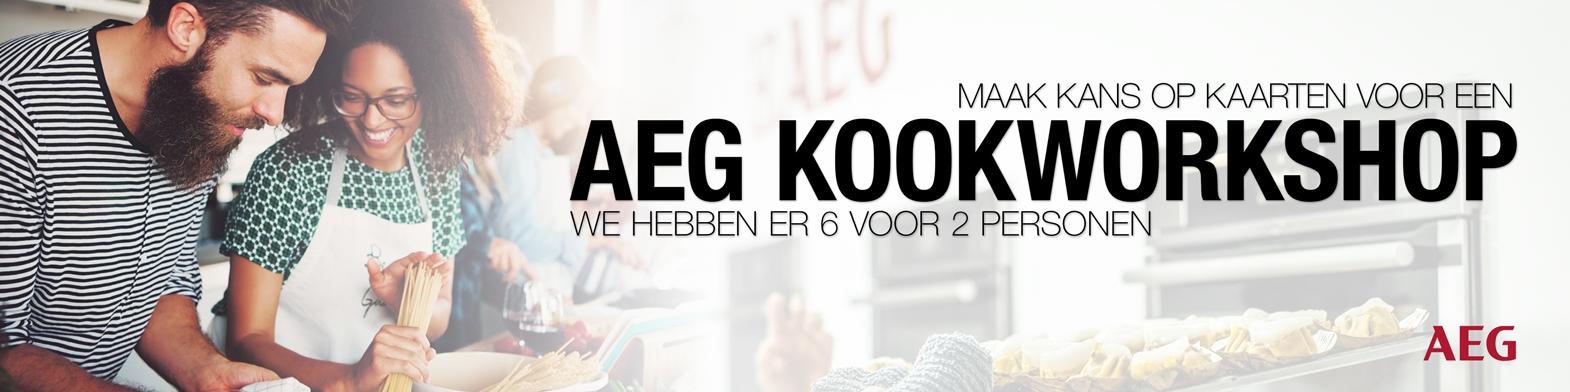 AEG kookworshop